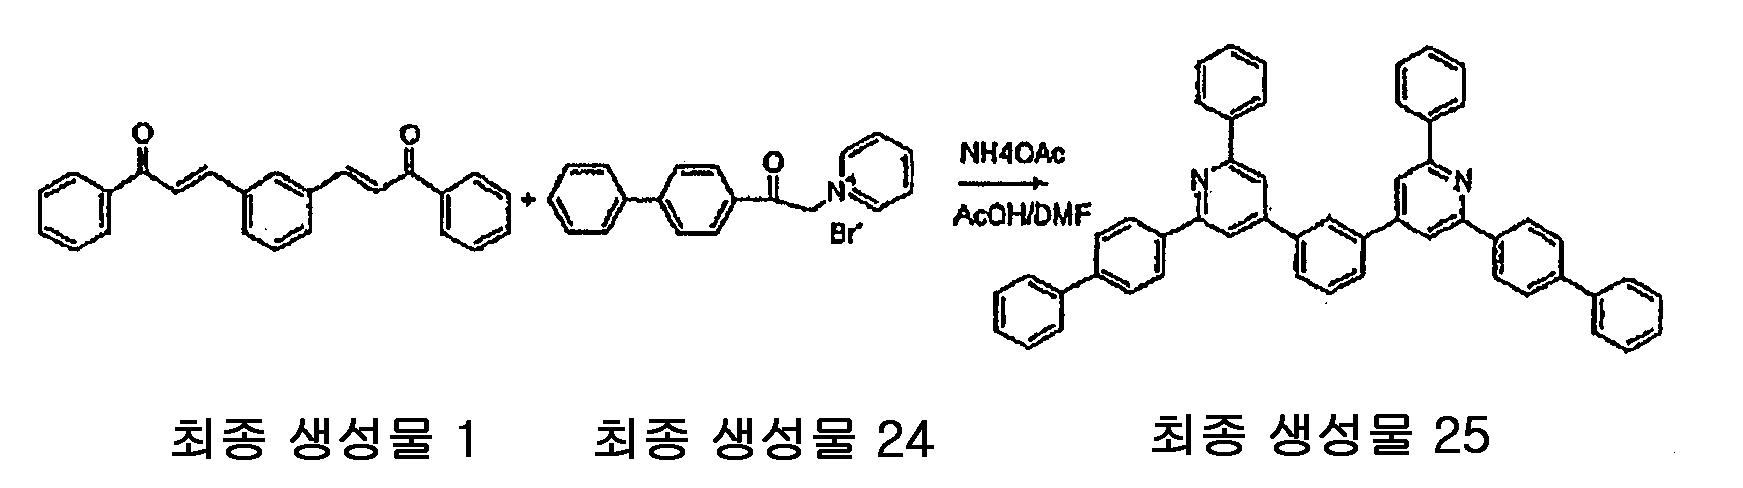 Figure 112010002231902-pat00120